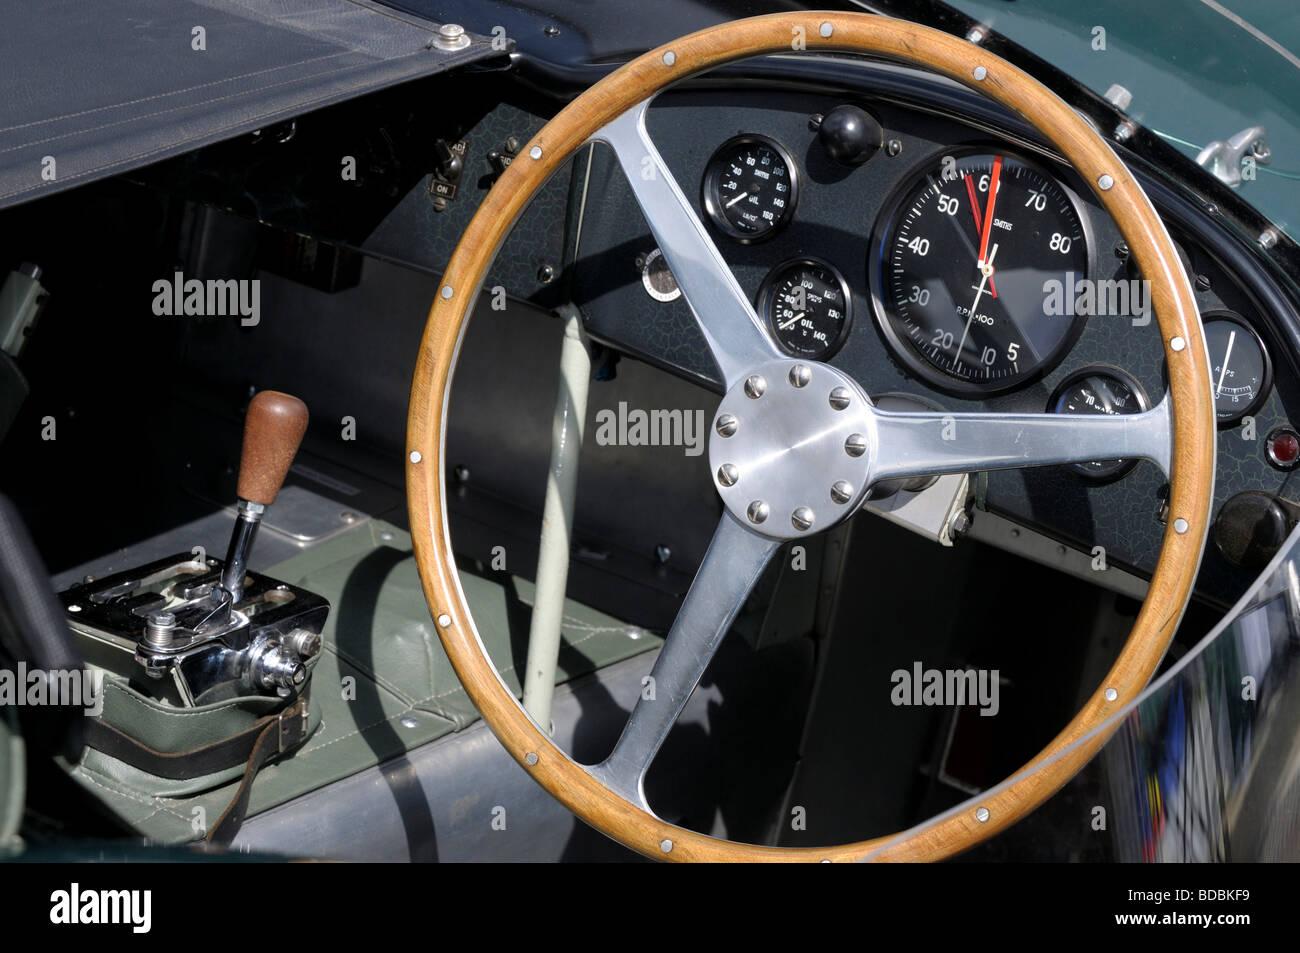 Racing car cockpit Silverstone Classic 2009 - Stock Image